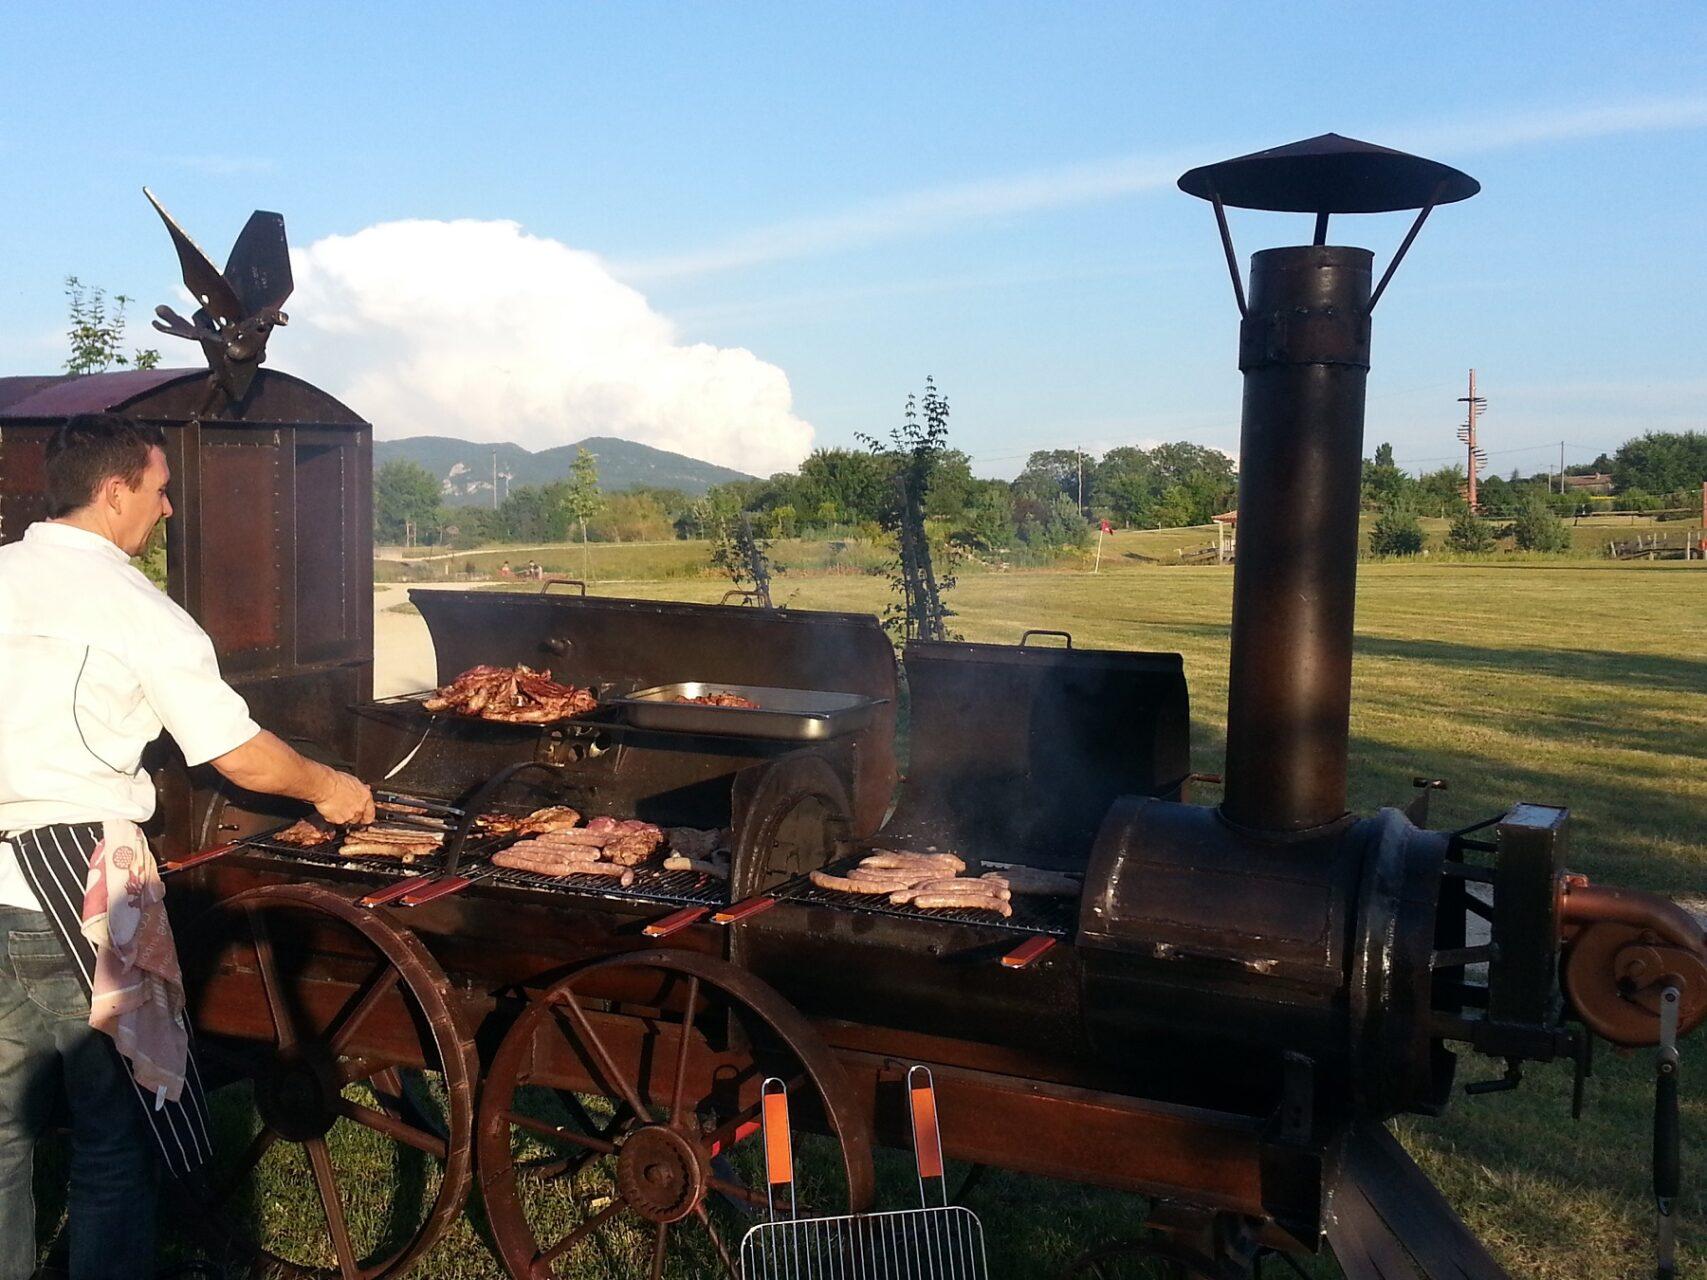 domaine-de-valsoyo-drome-team-building-seminaires-de-caractere-barbecue